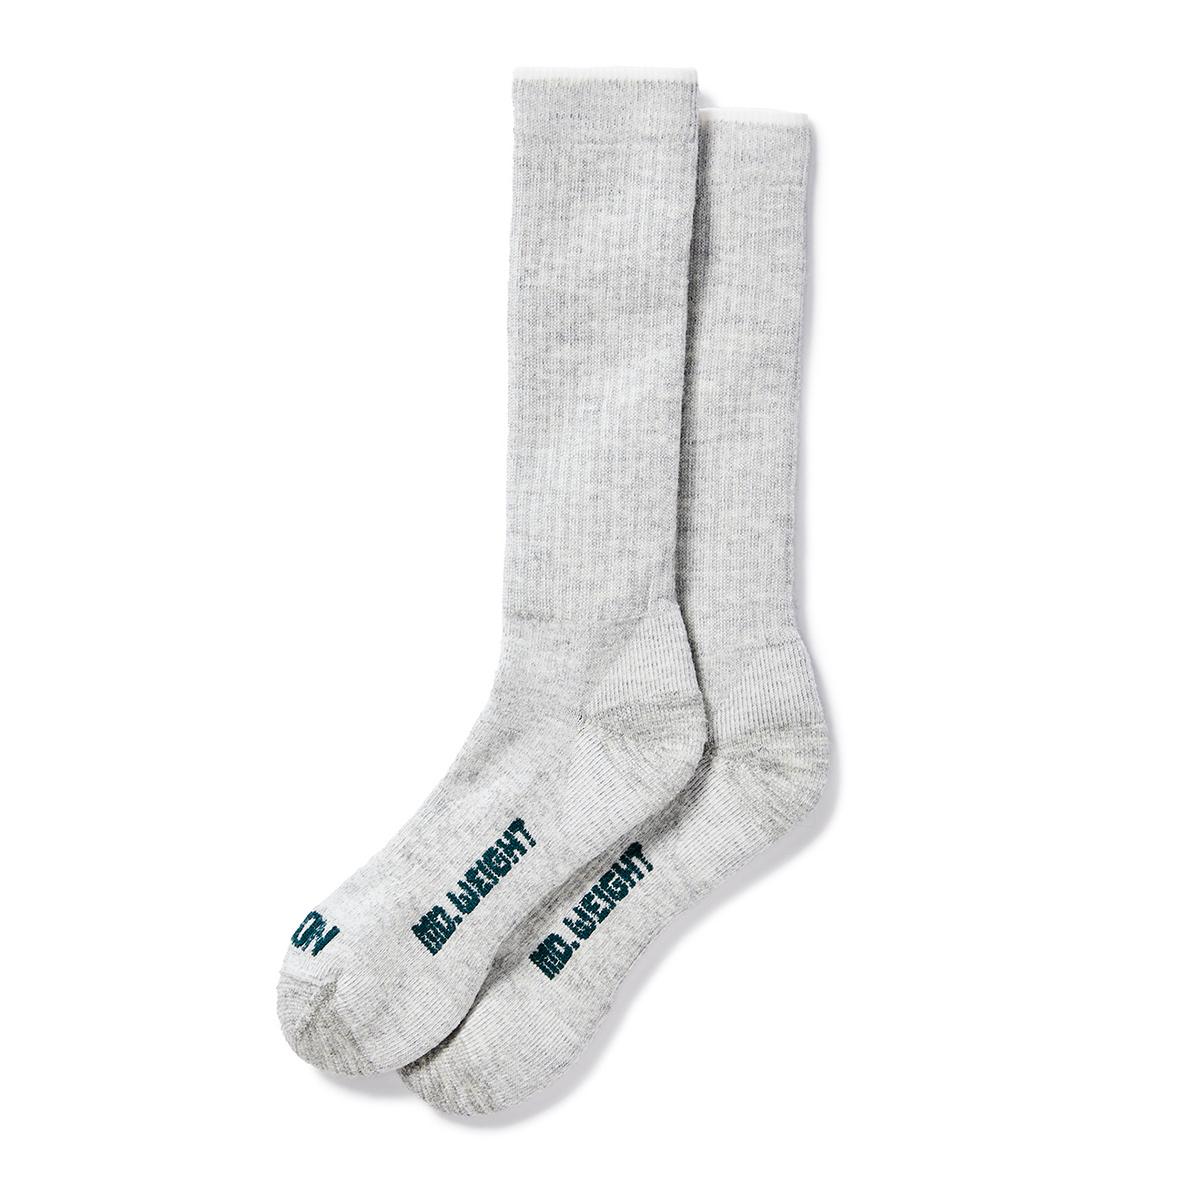 Filson Mediumweight Traditional Crew Socks gemaakt van merino wol met een vleugje nylon en spandex